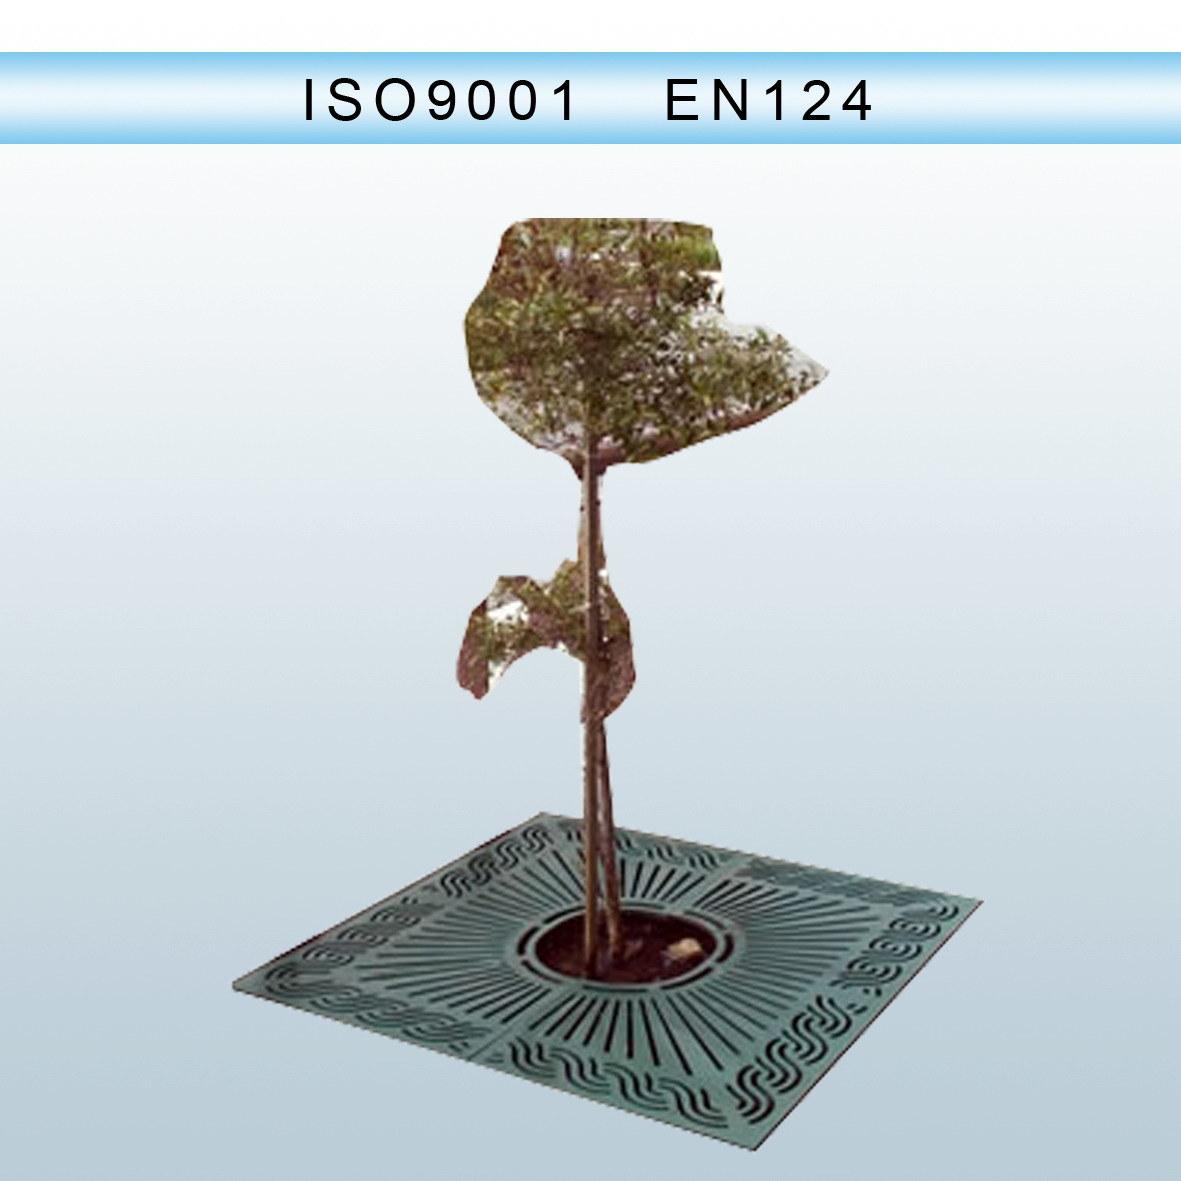 En124 Ductile Iron Casting Tree Gratings Round/Square